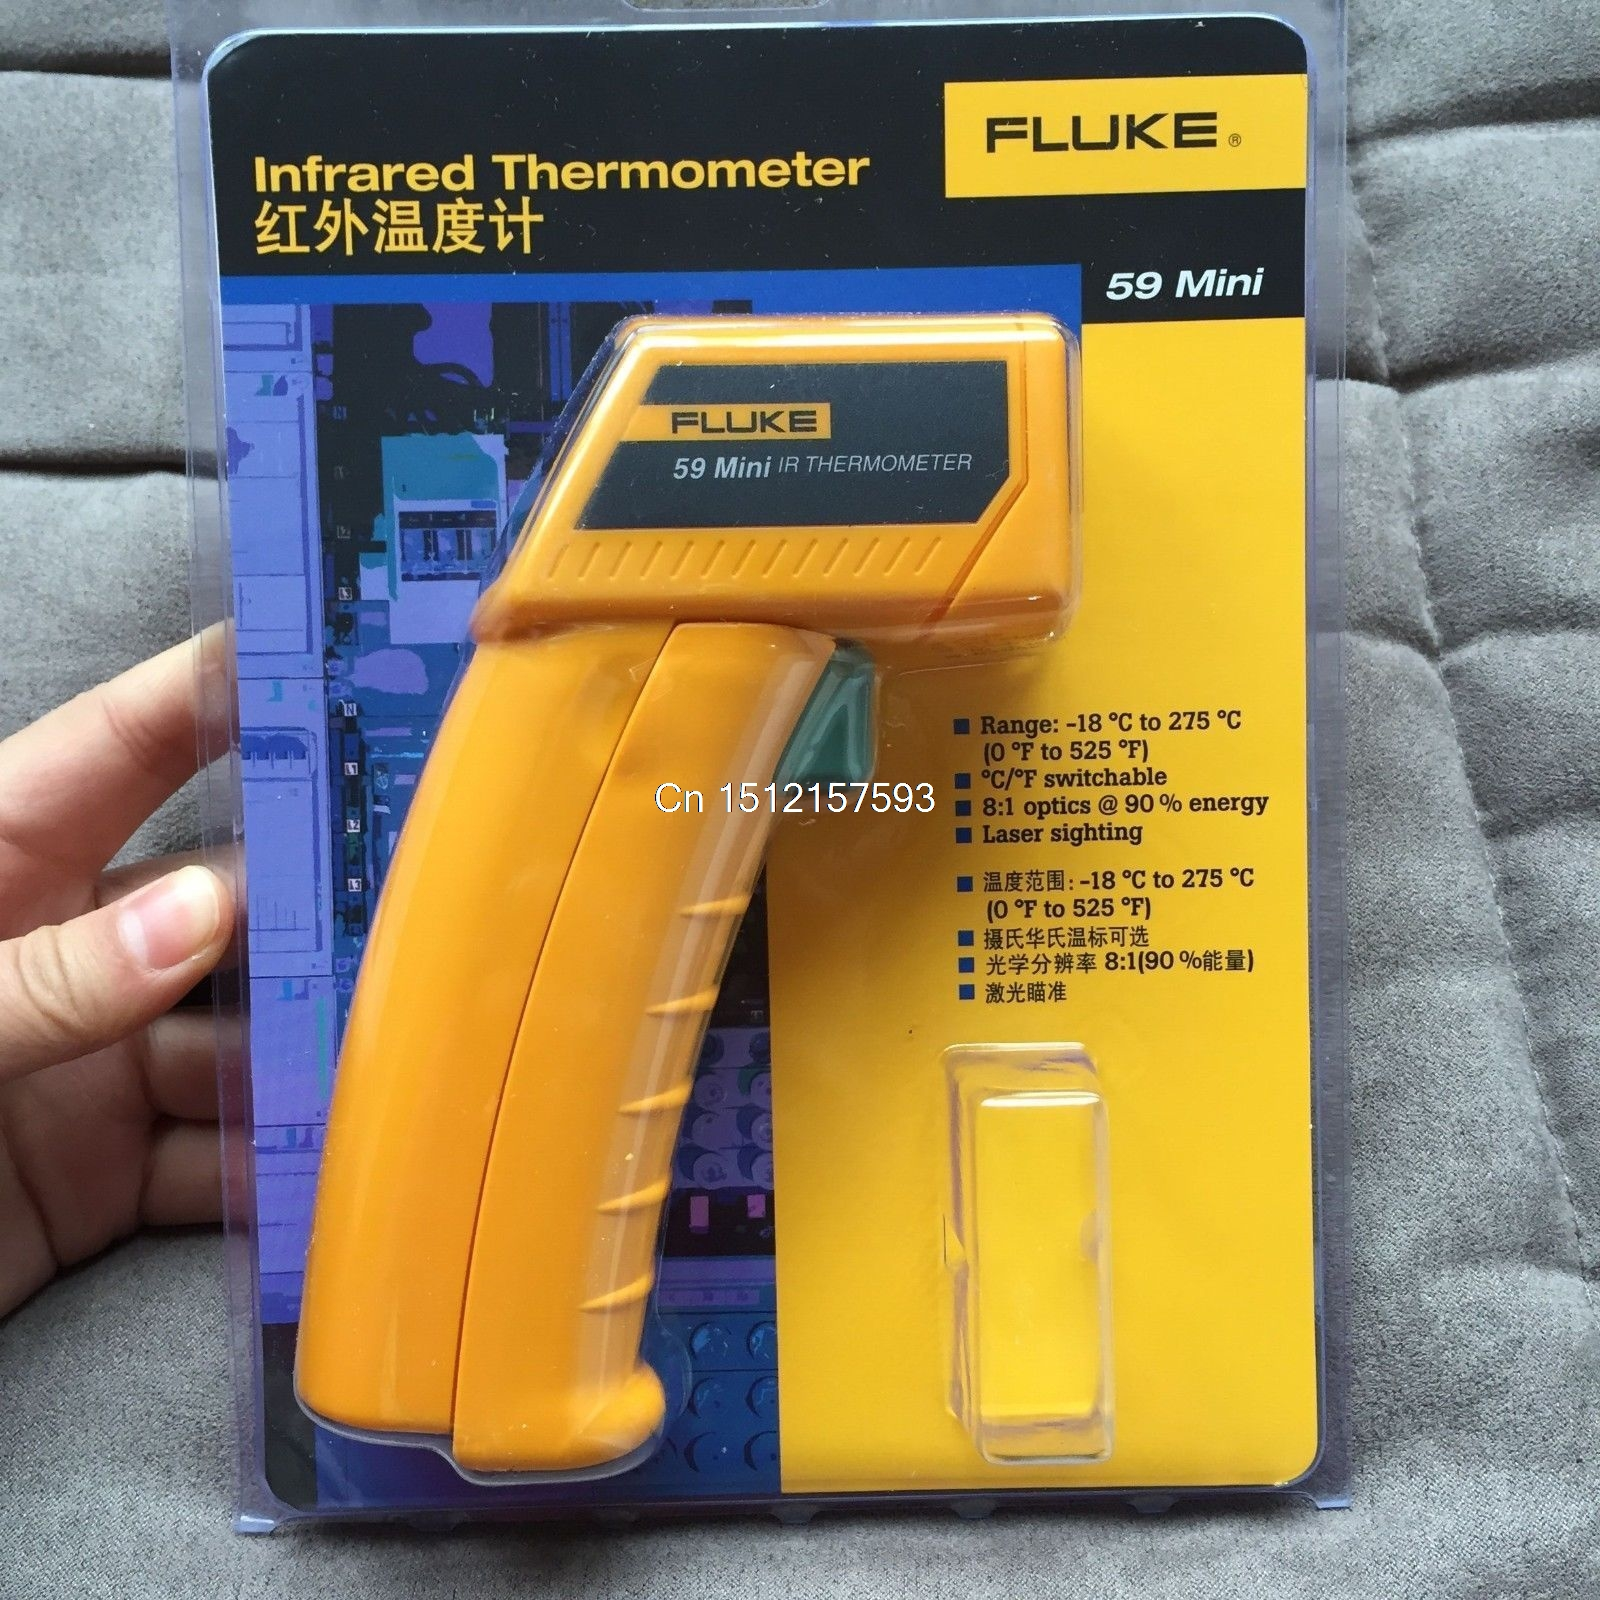 Fluke59 Handheld Laser IR Infrared Thermometer Gun Temperature Meter Tester кроссовки the north face кроссовки lite ii gtx